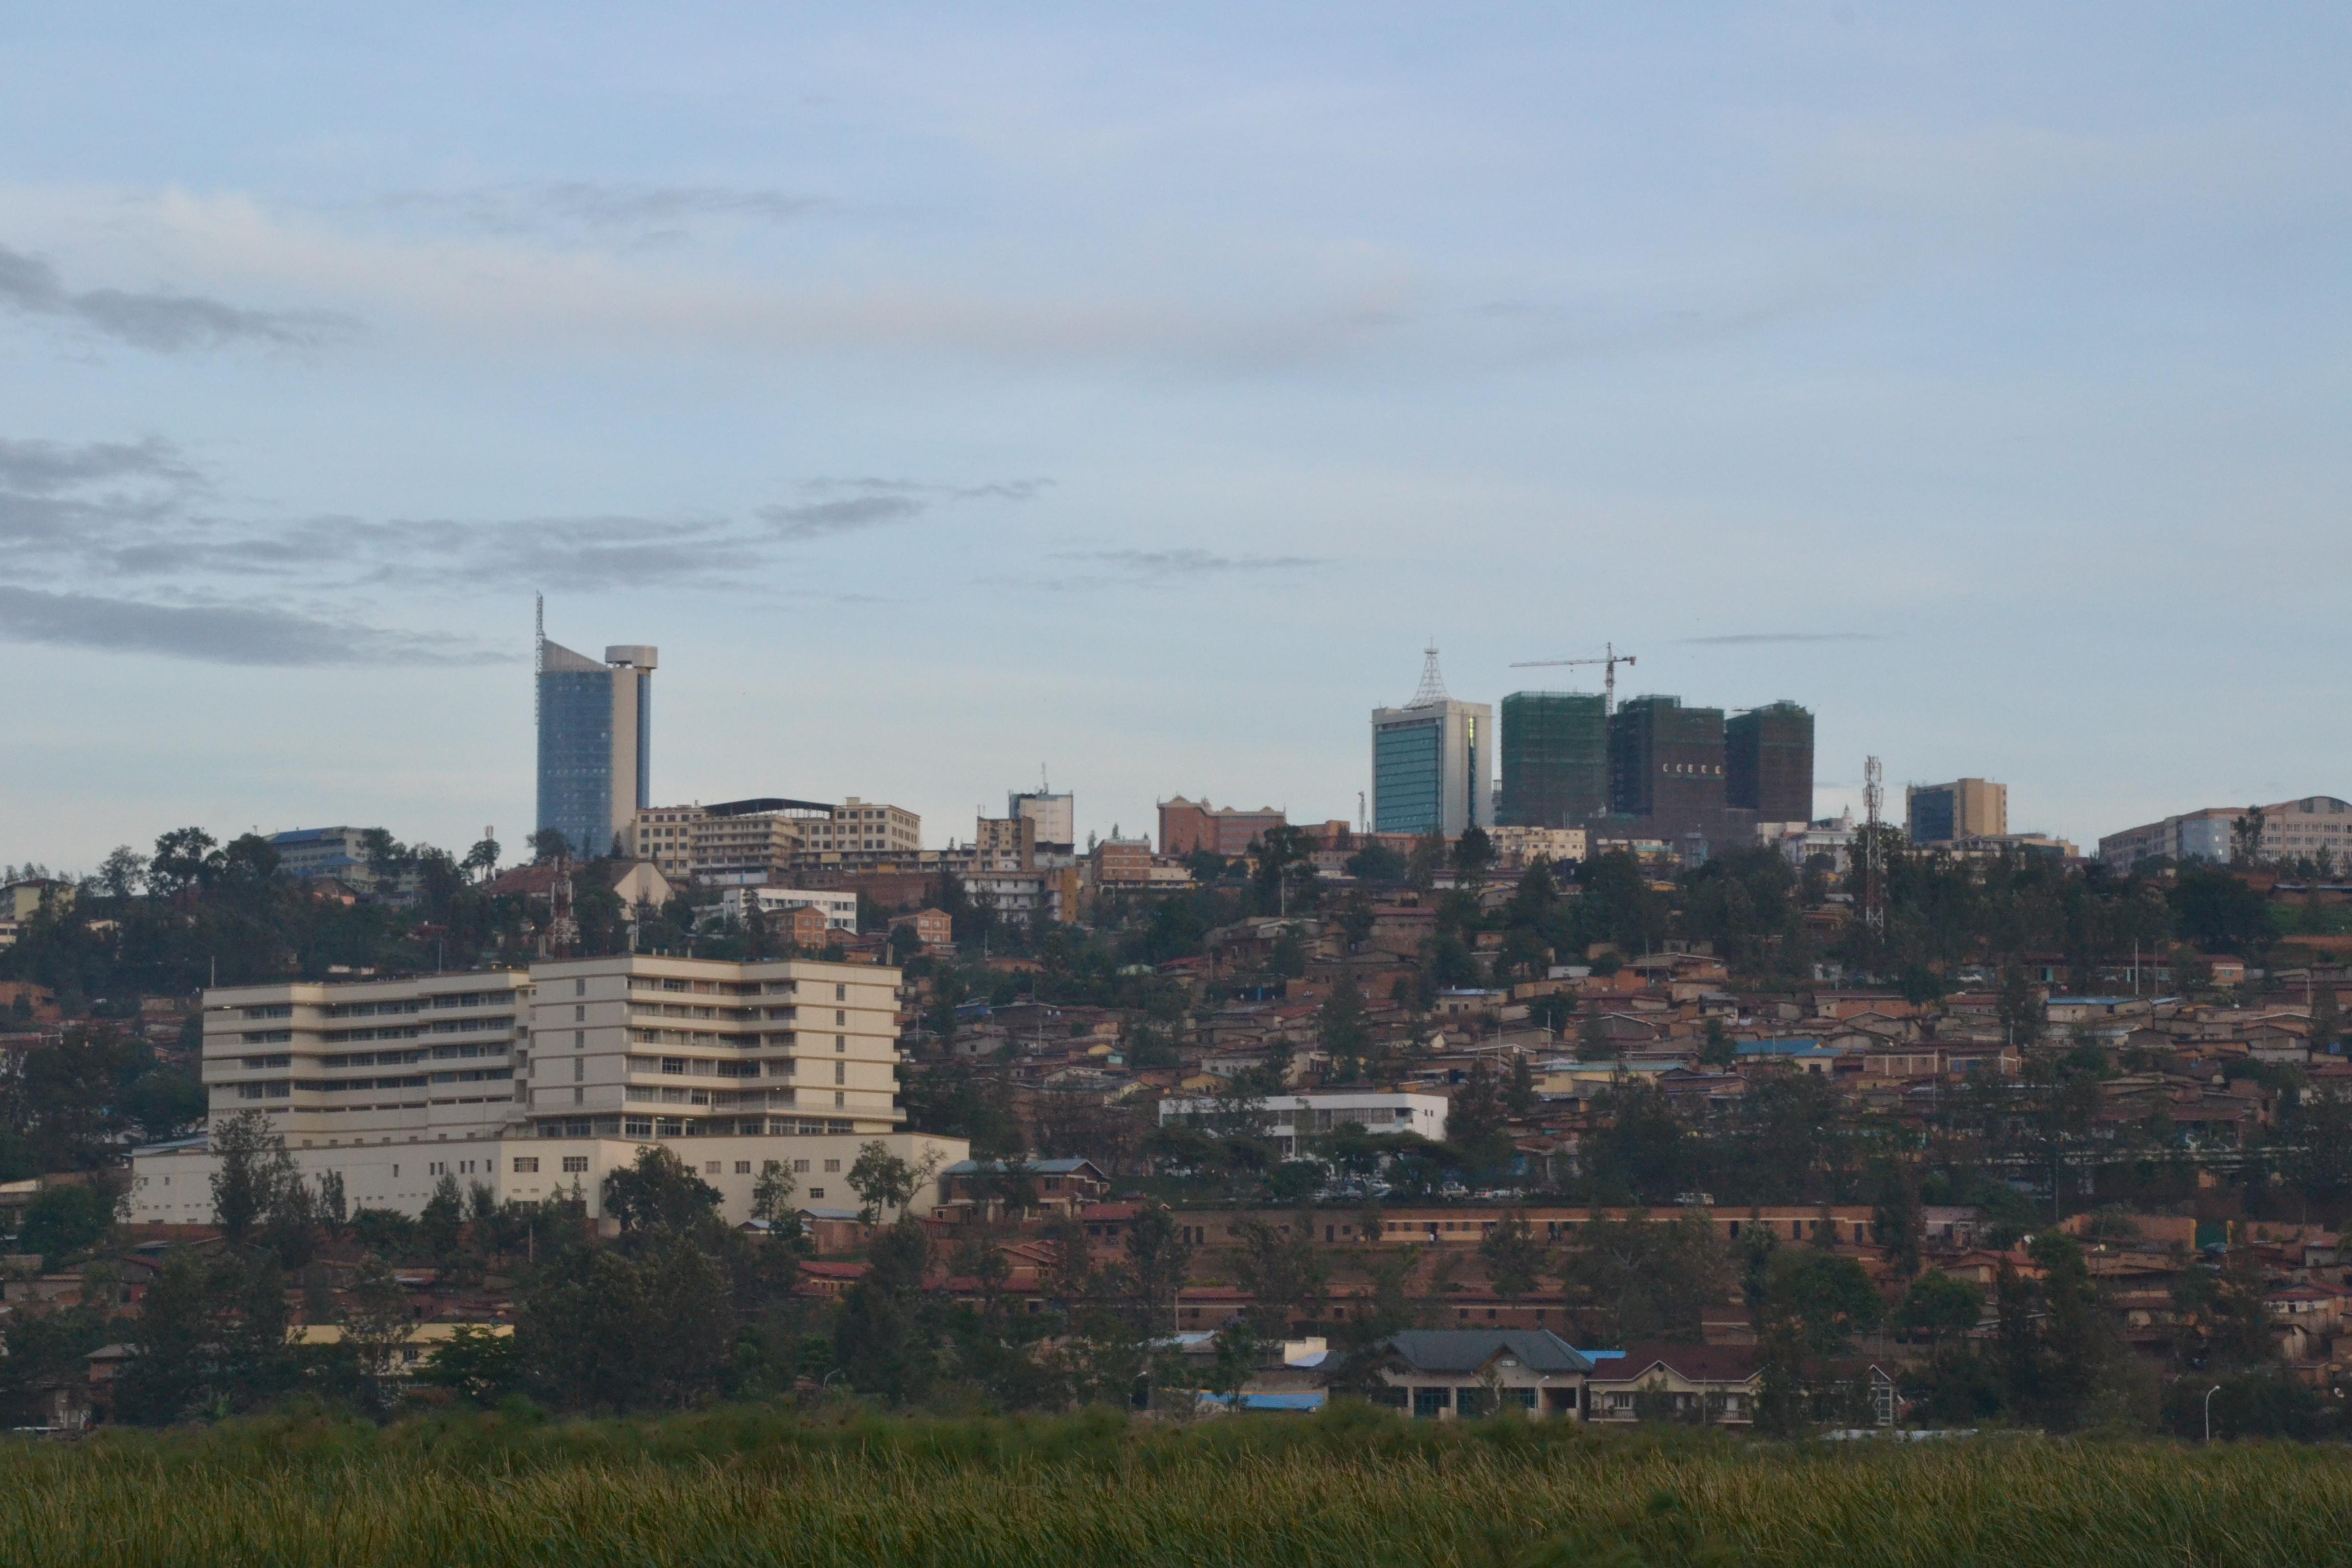 Kigali Rwanda  City pictures : Description Downtown Kigali and papyrus marsh October 2012